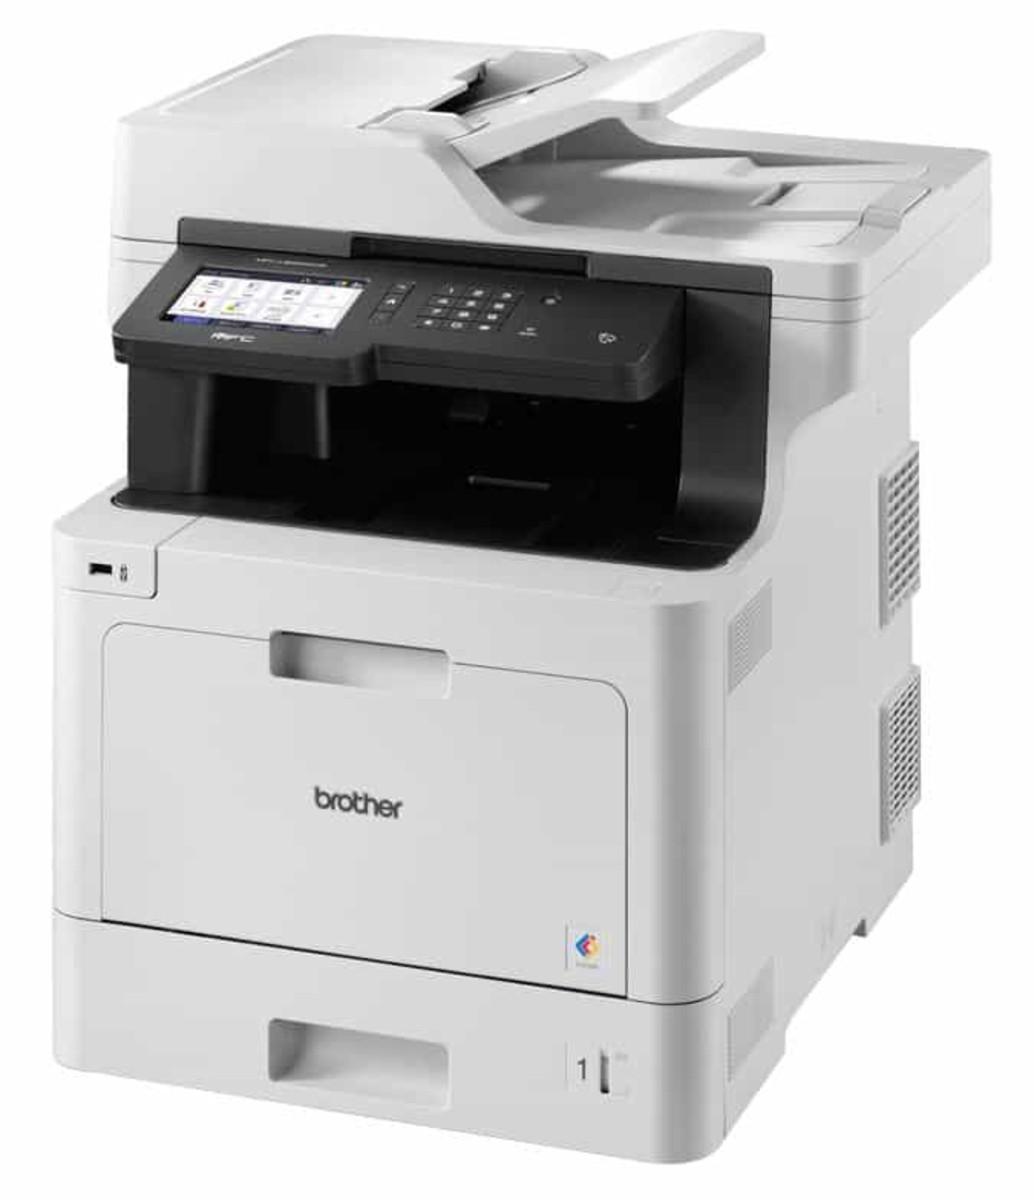 Brother MFC-L8900CDW Laser Printer